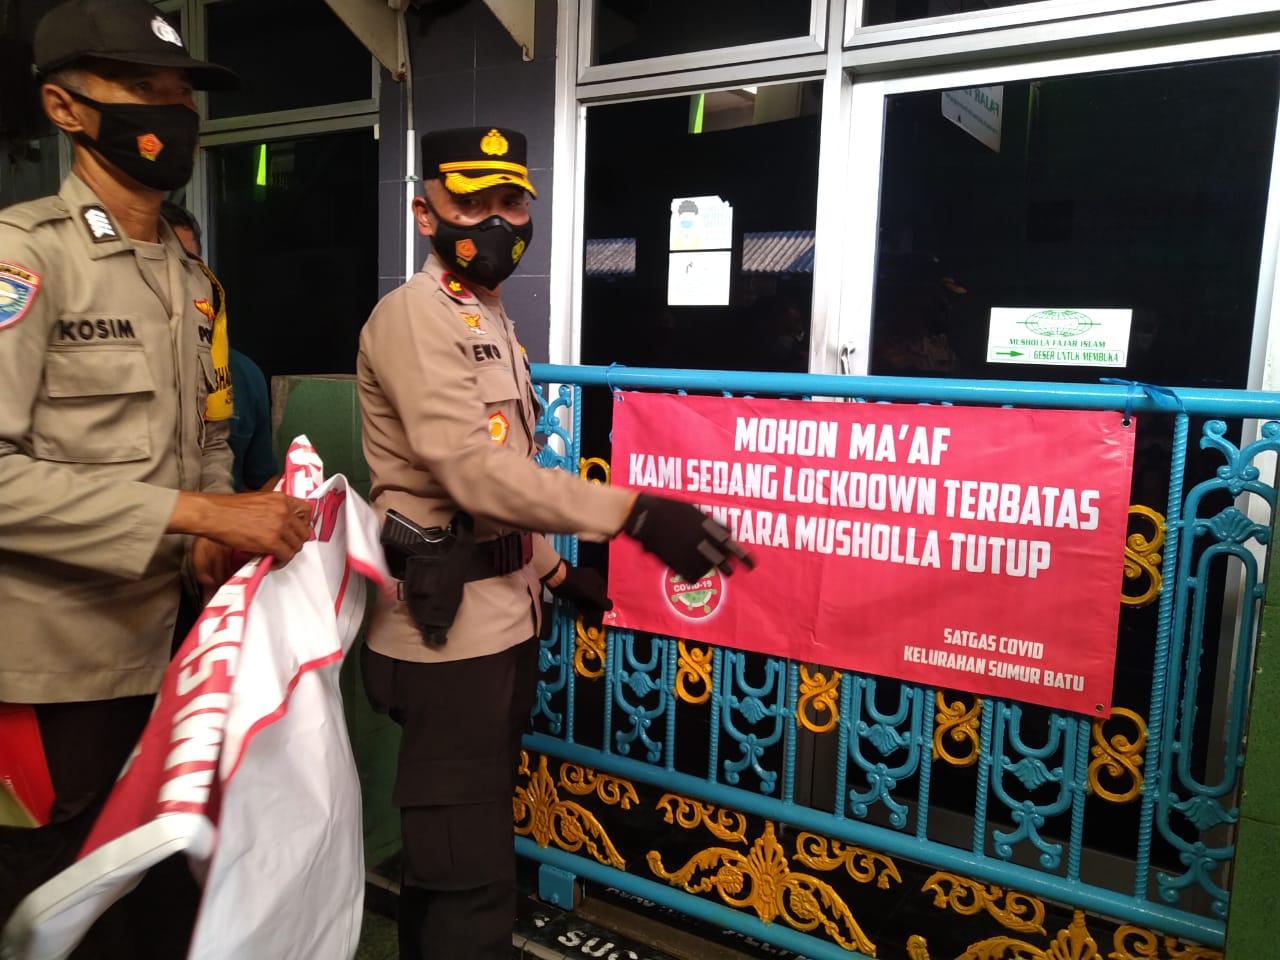 Jajaran Polres Jakarta Pusat membantu warga di tiga RT di Kelurahan Sumur Batu, Kemayoran, Jakarta Pusat yang menerapkan mikro lockdown. (Foto: PMJ News/ Yeni).